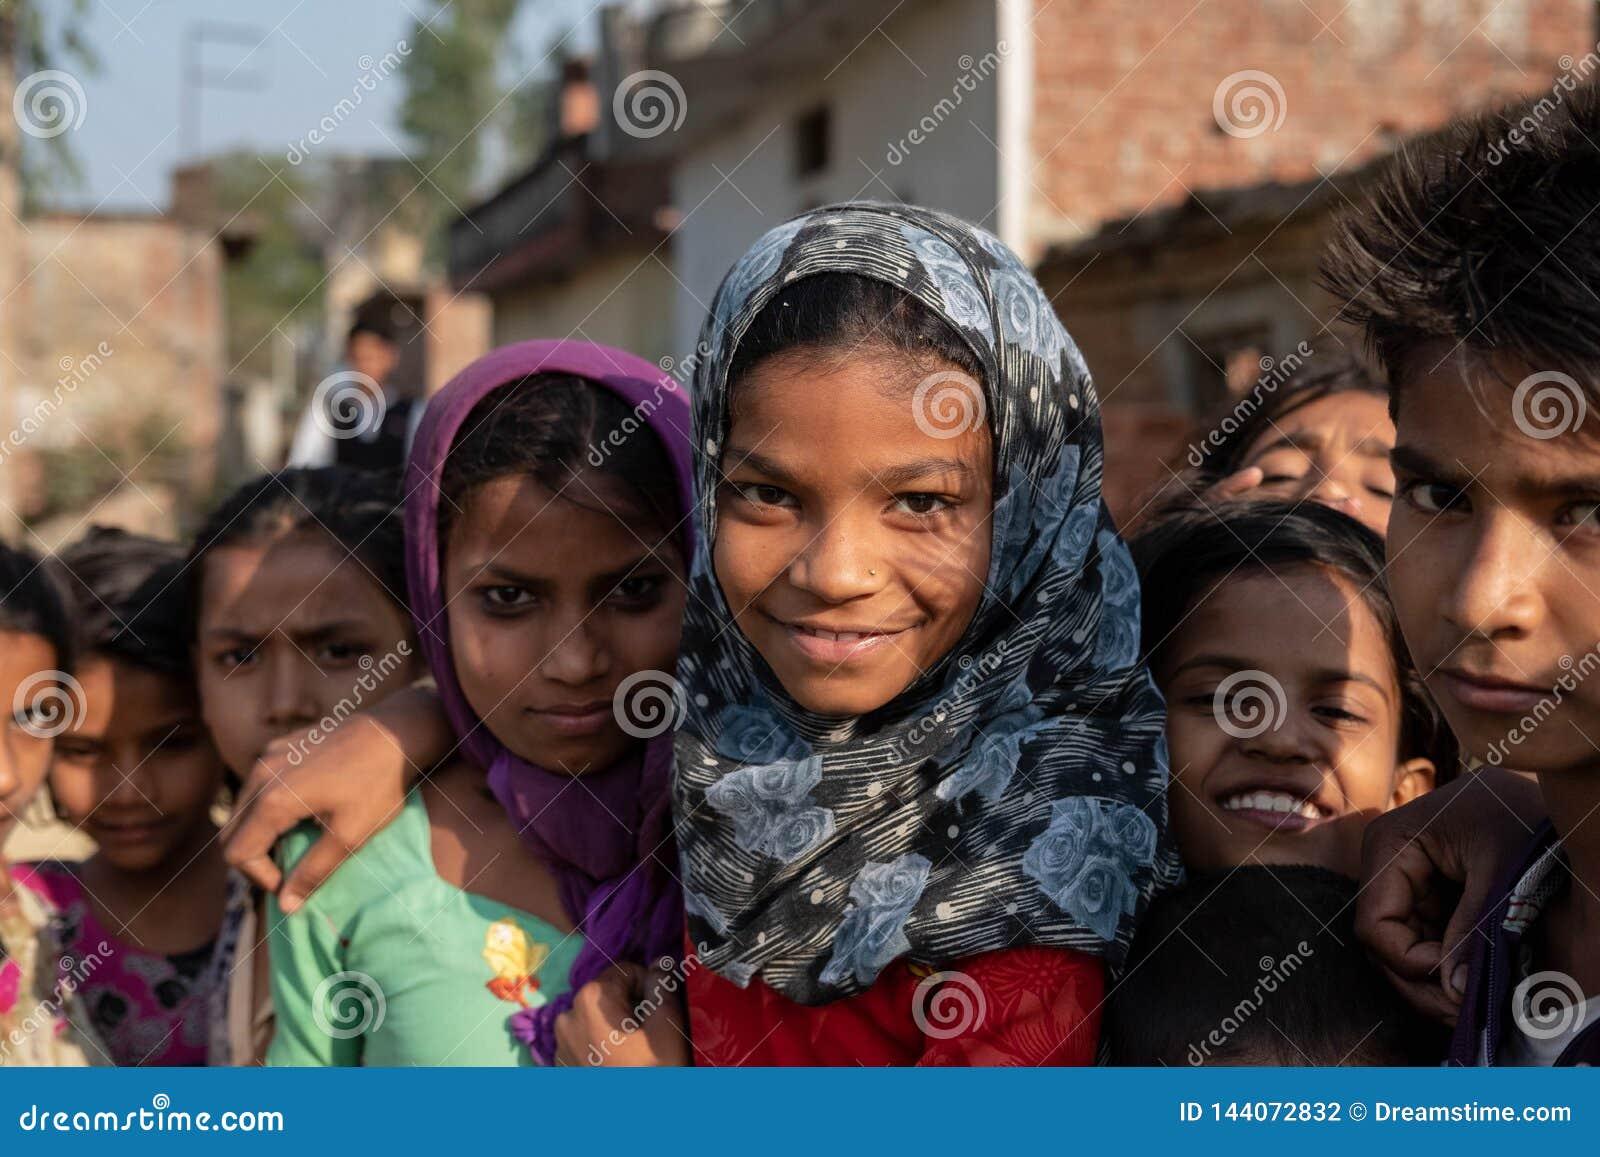 Bhadarsa, Ουτάρ Πραντές/Ινδία - 2 Απριλίου 2019: Μια ομάδα κοριτσιών θέτει για μια φωτογραφία έξω από το χωριό τους